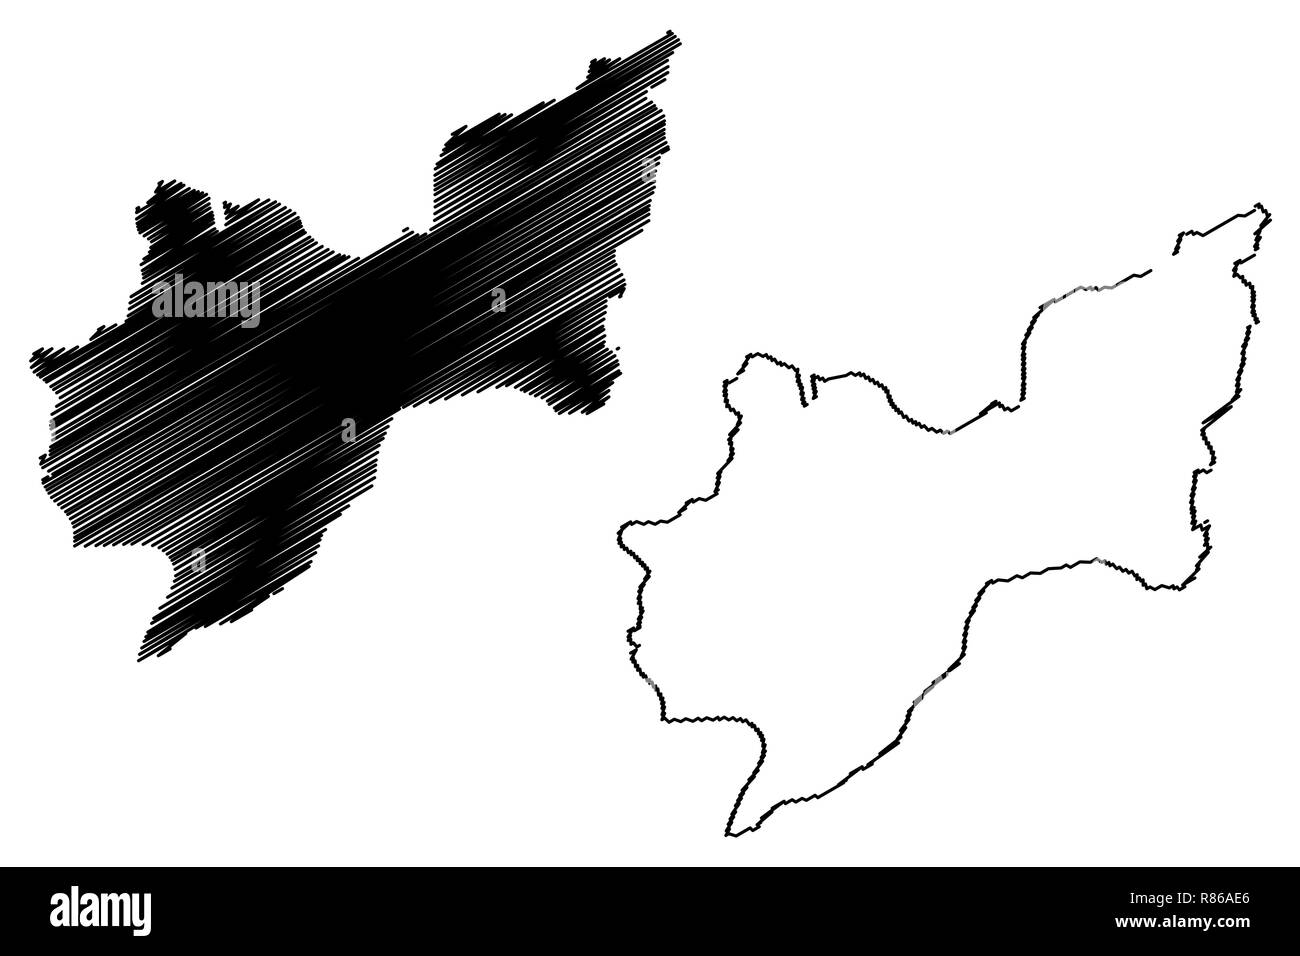 Tekirdag (Provinces of the Republic of Turkey) map vector illustration, scribble sketch Tekirdag ili map - Stock Image